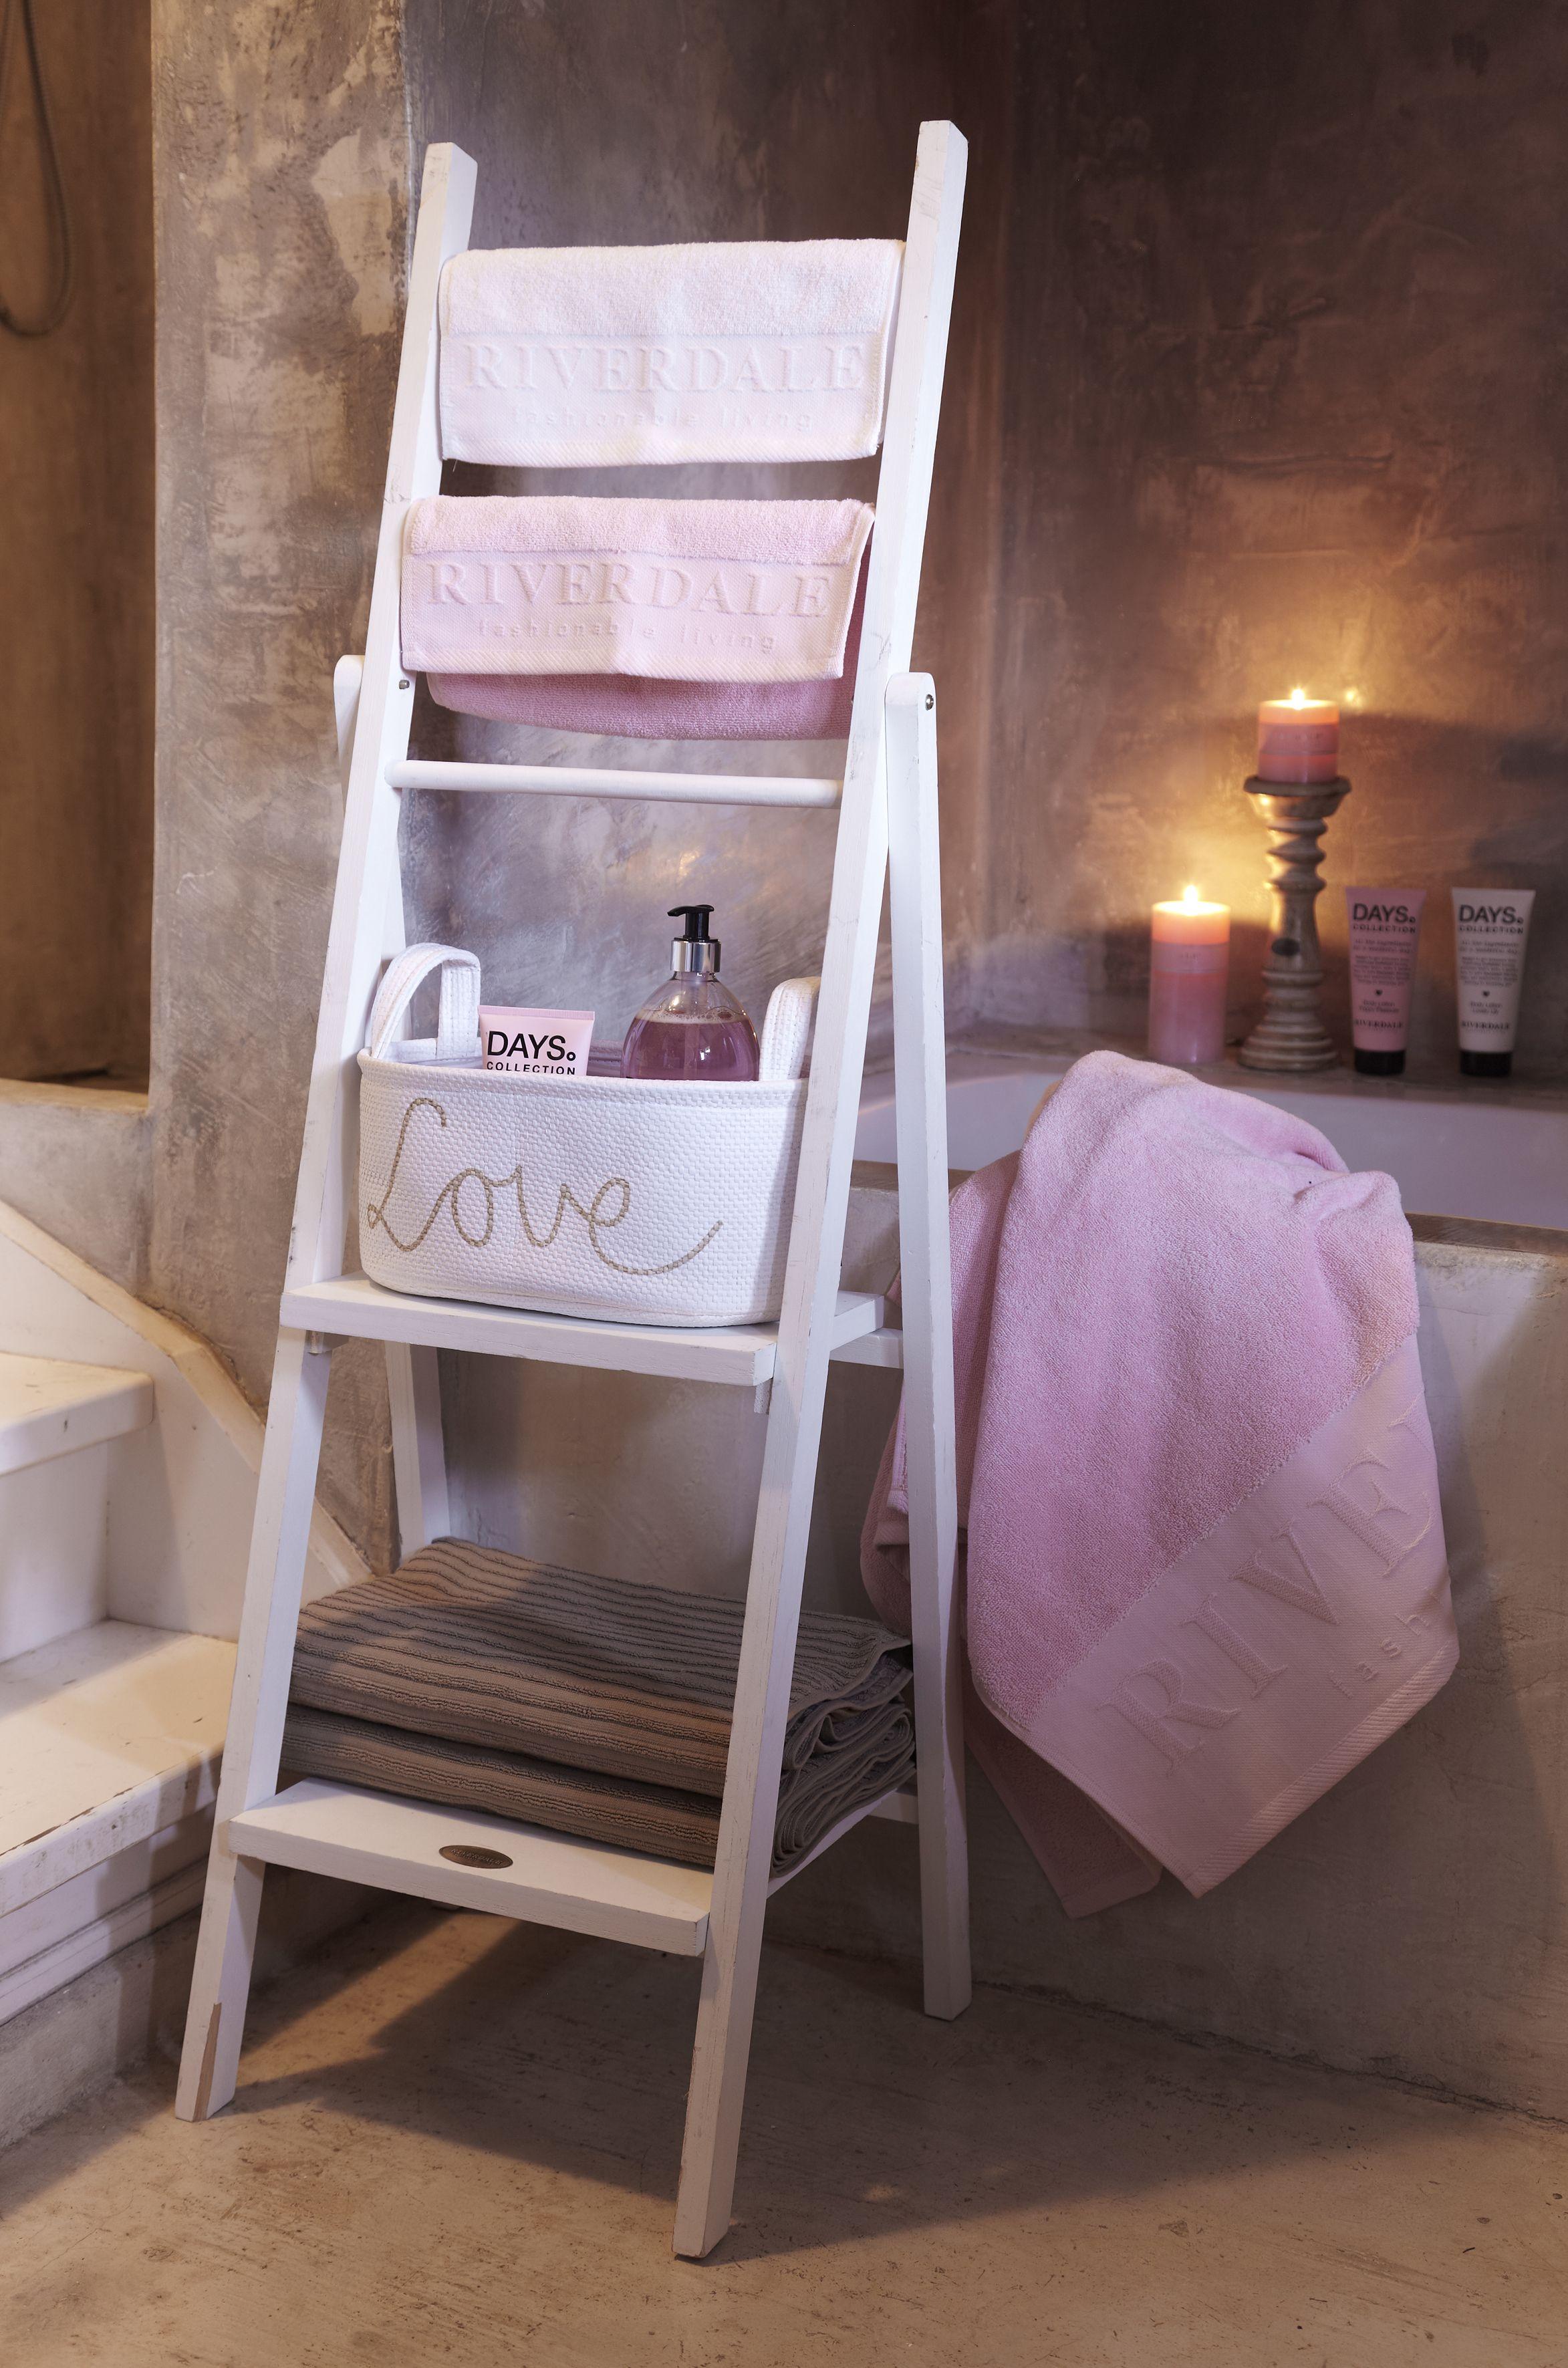 riverdale home sweet home pinterest badkamer badkamers en